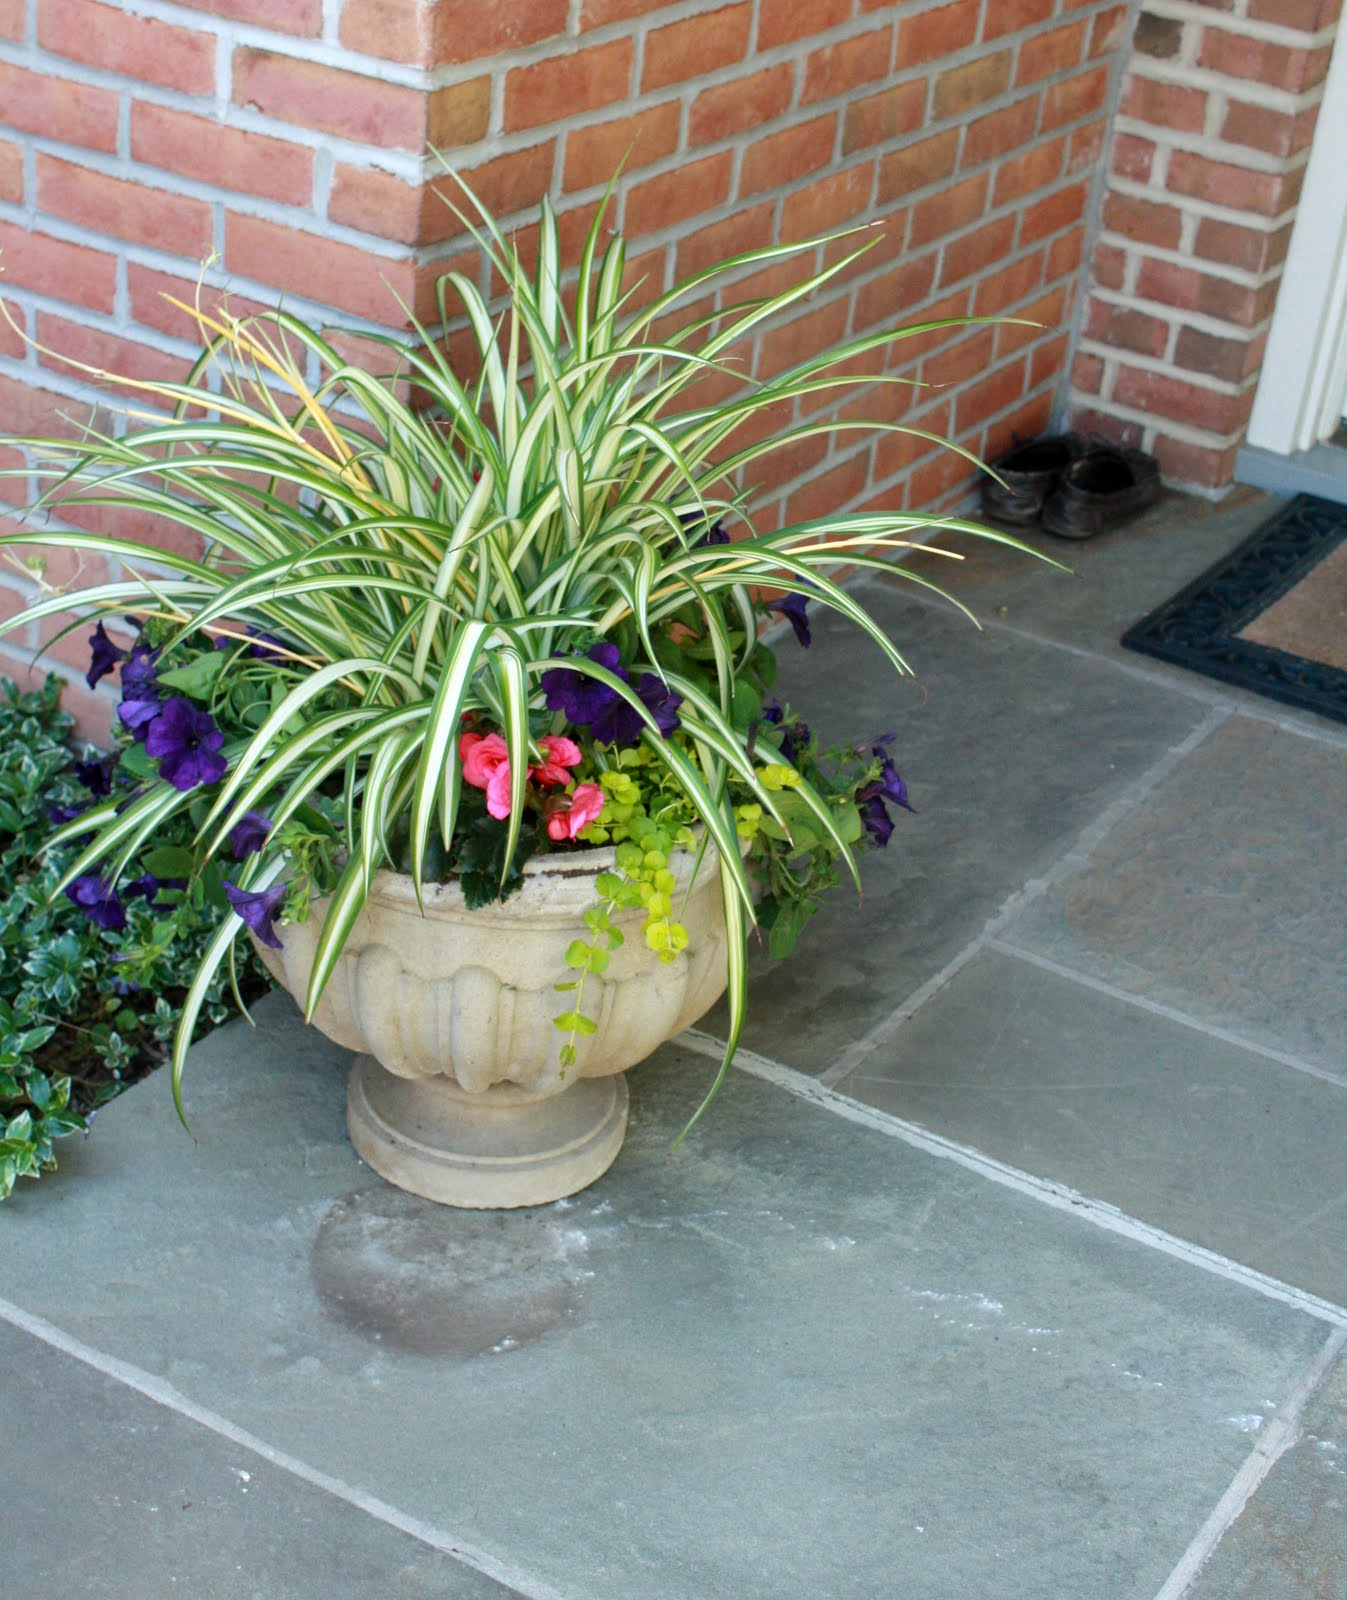 flores del sol thursday morning spider plant propagation